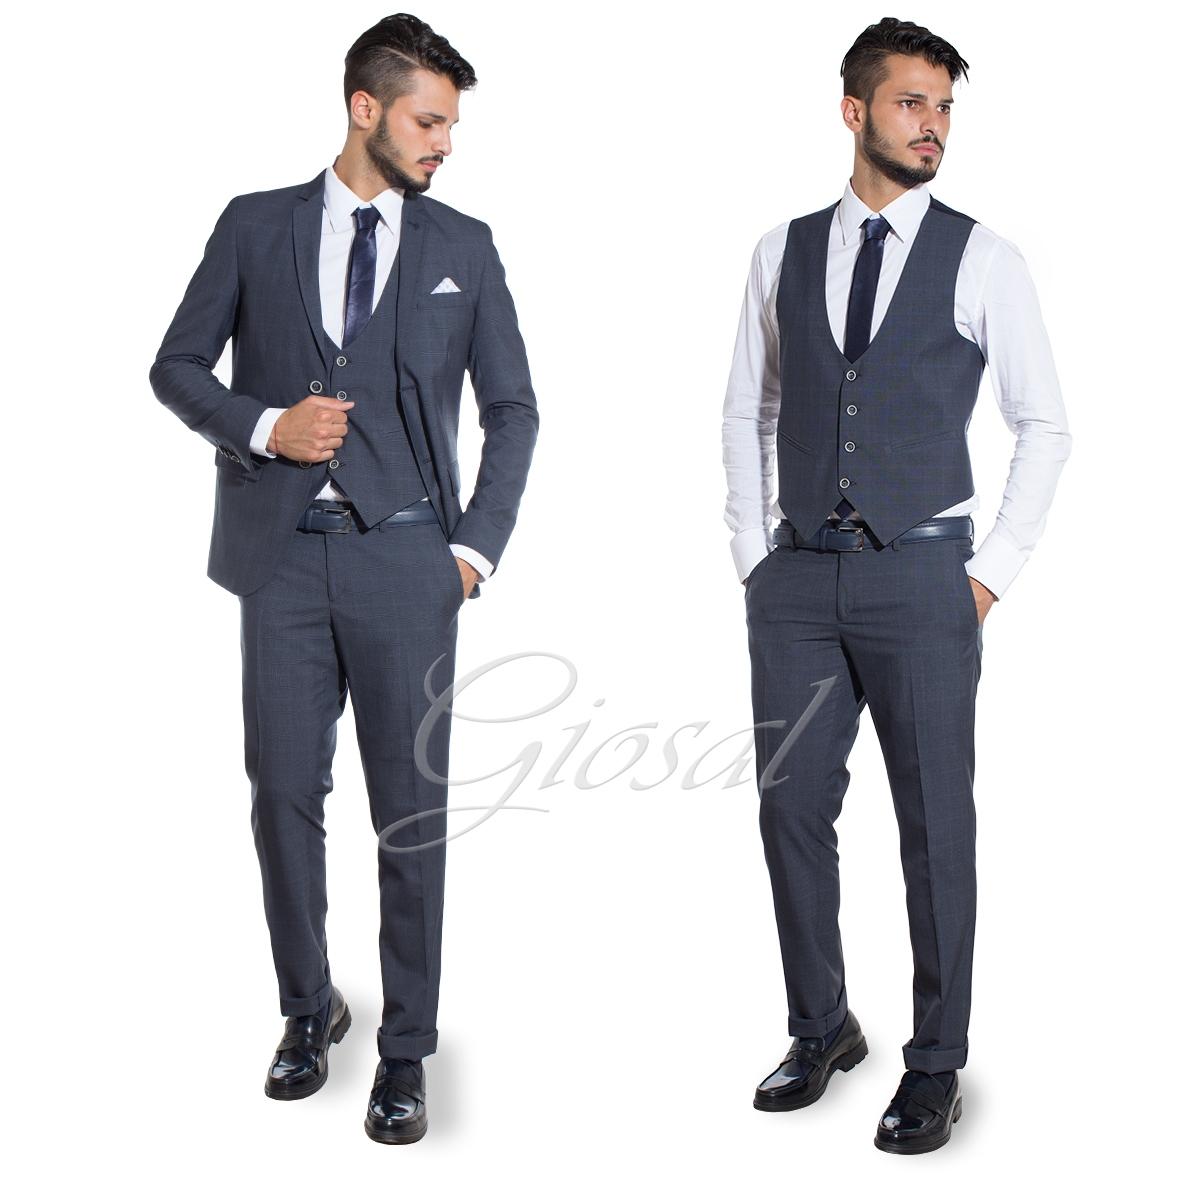 Vestiti Eleganti Uomo Grigio.Abito Elegante Uomo Completo Pantaloni Giacca Gilet Panciotto